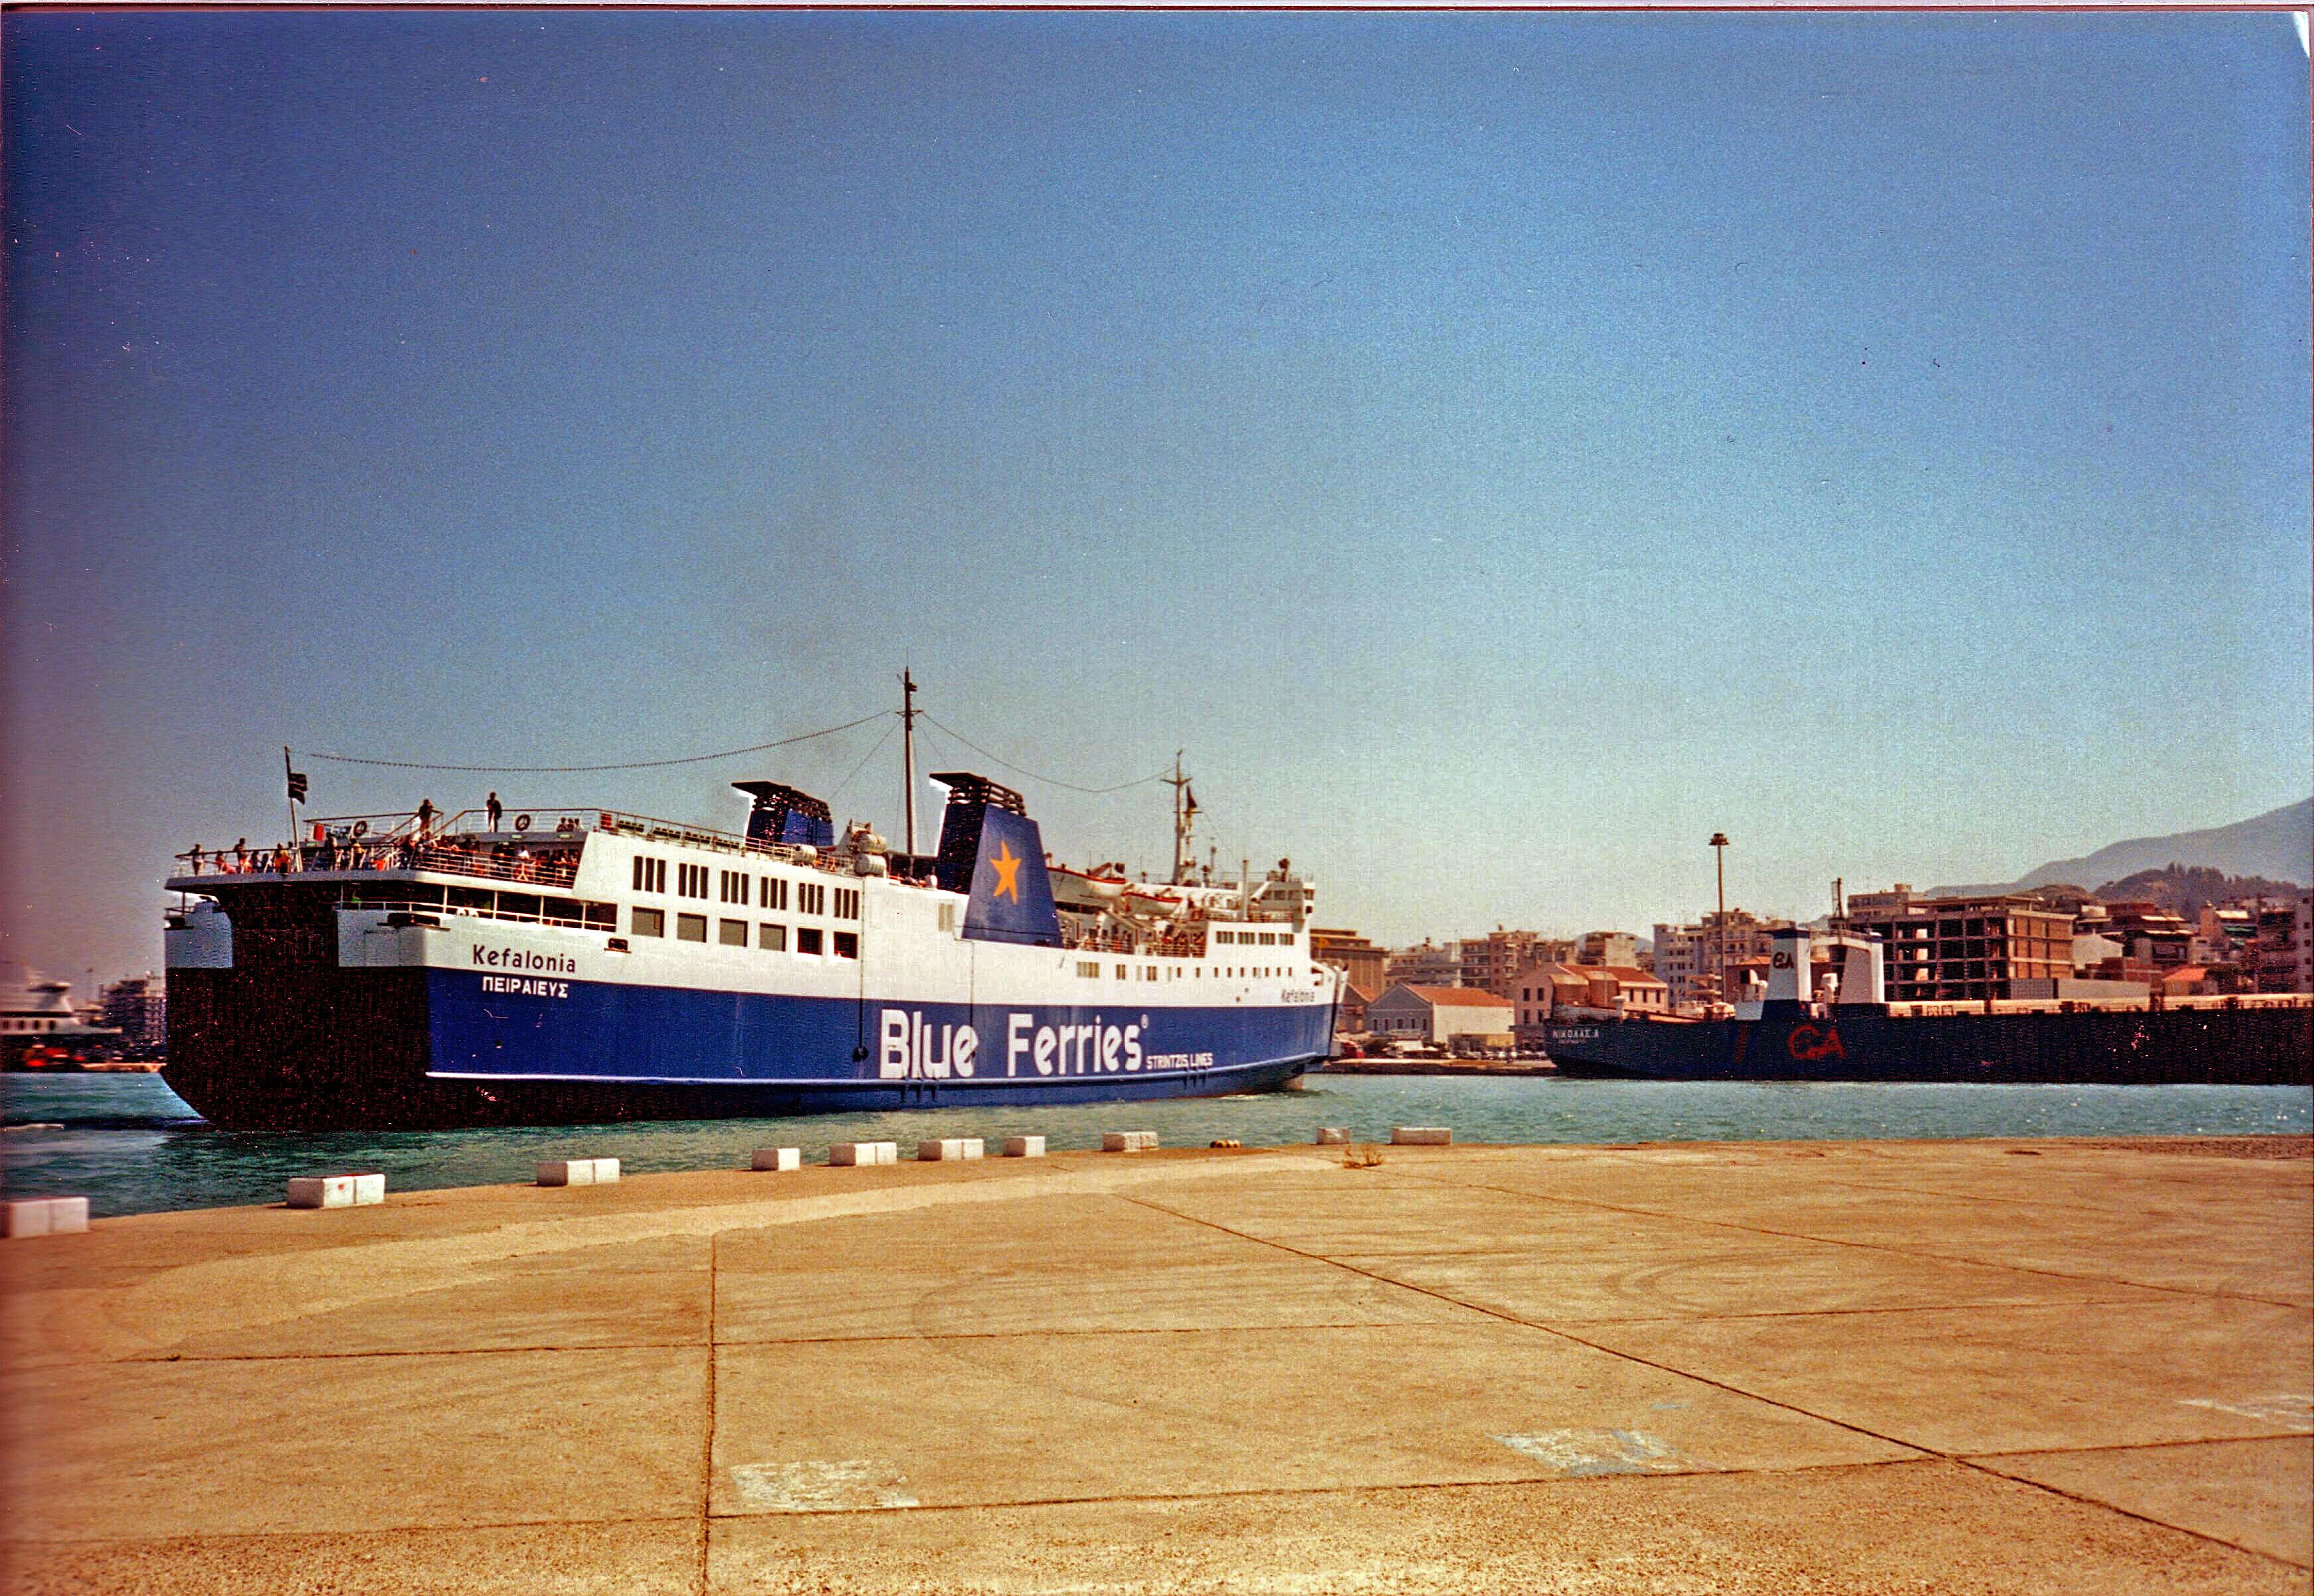 BLUE FERRIES FB Kefalonia 03